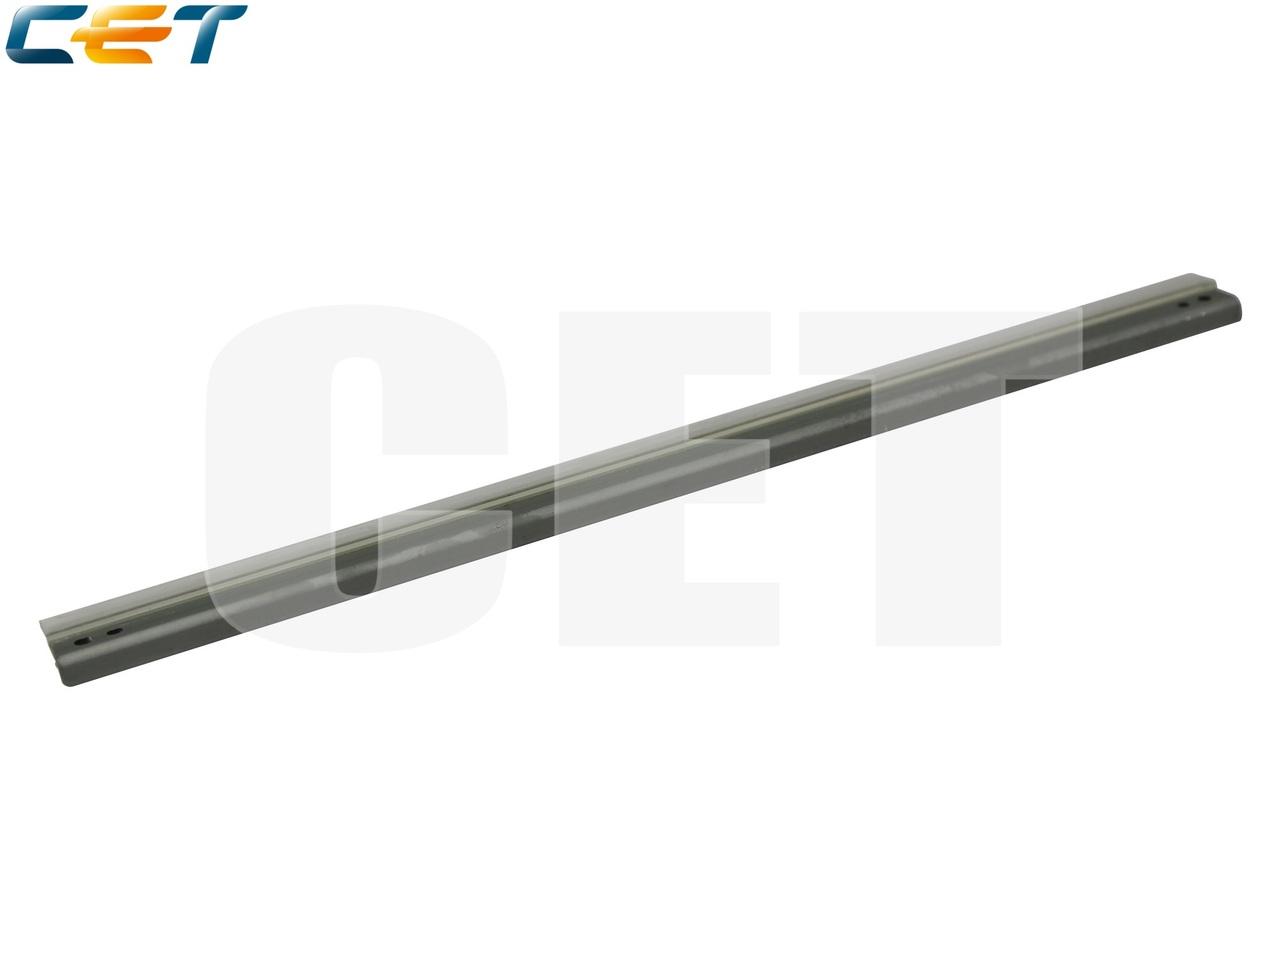 Ракель для RICOHMPC3003/MPC3503/MPC4503/MPC5503/MPC6003 (CET),CET6202